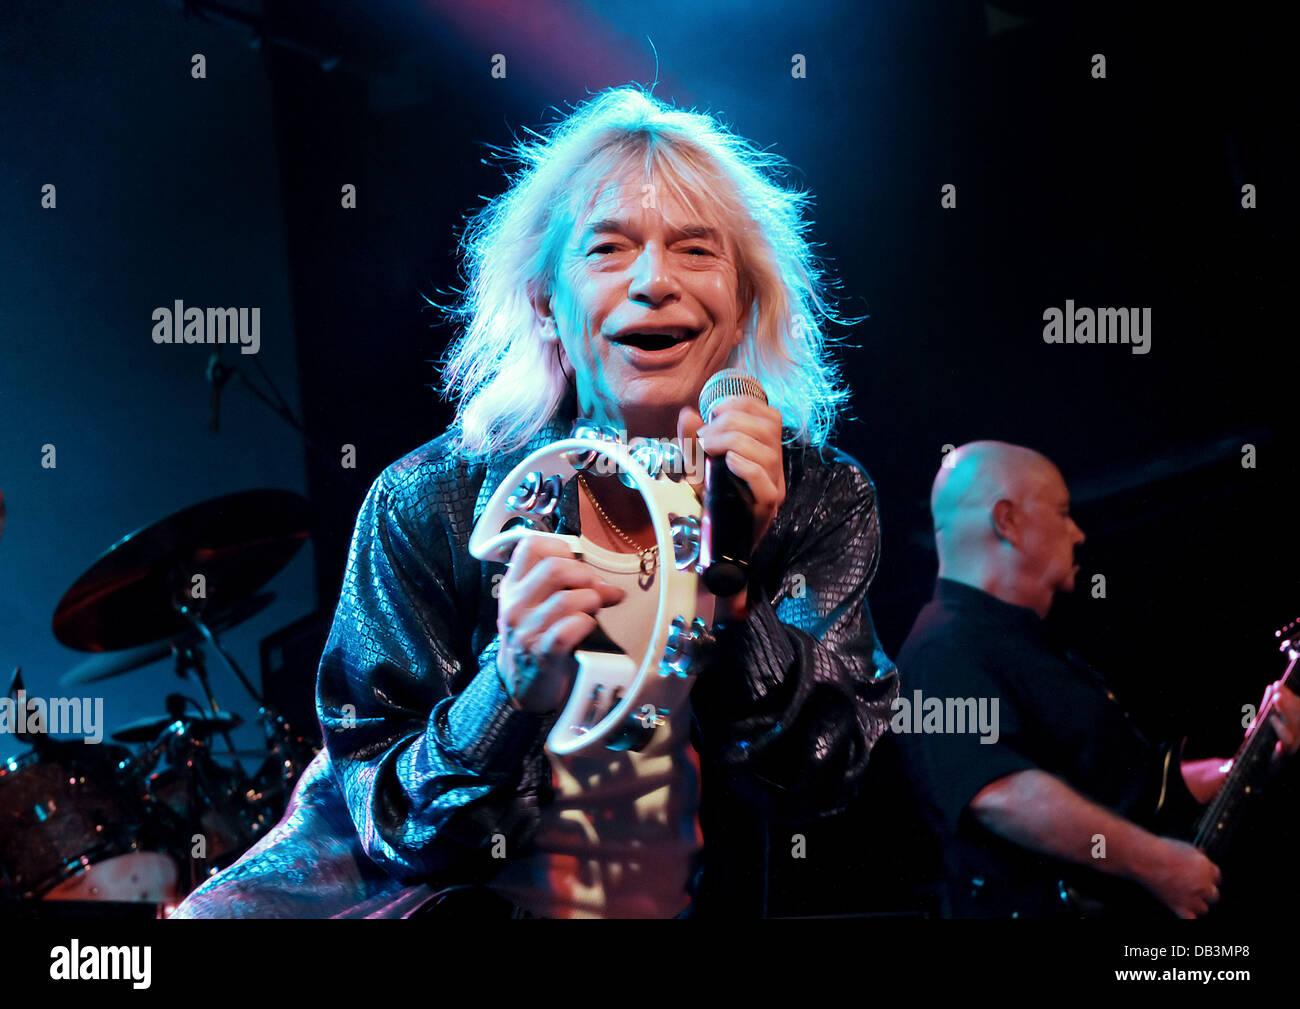 Bob Catley Progressive Rock Band Magnum Performing at Liverpool Stock Photo: 58474480 - Alamy